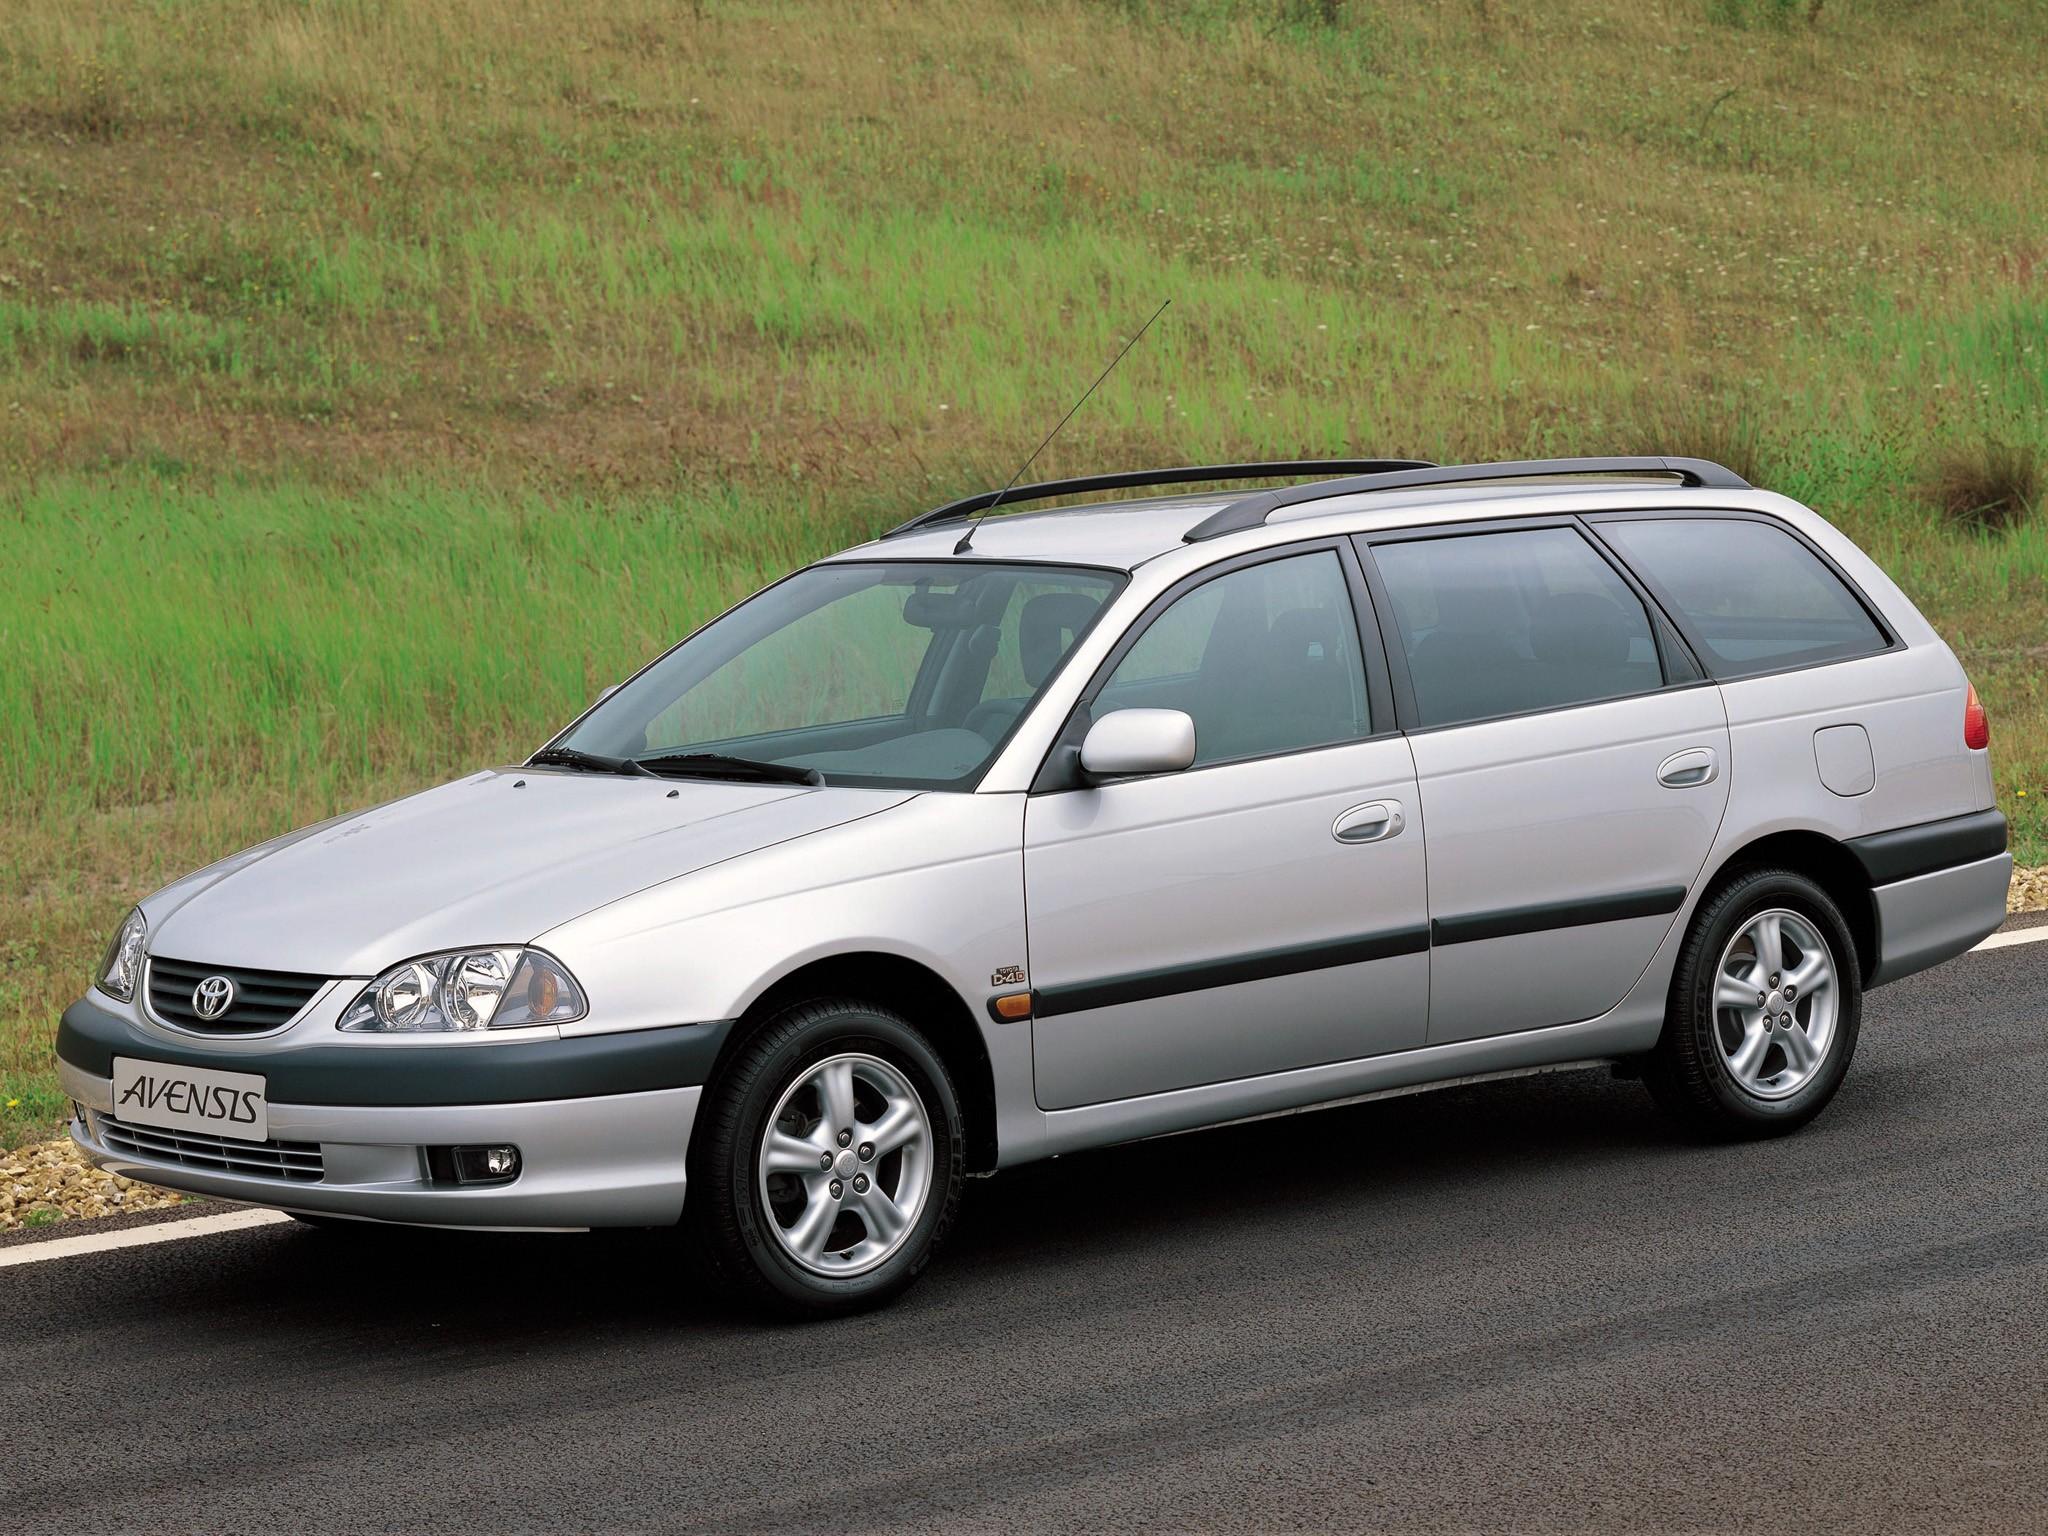 Toyota Caldina 2000toyota Gt Four The Scion Im That Never Wiring Diagram Avensis Wagon 1997 1998 1999 2000 Autoevolution